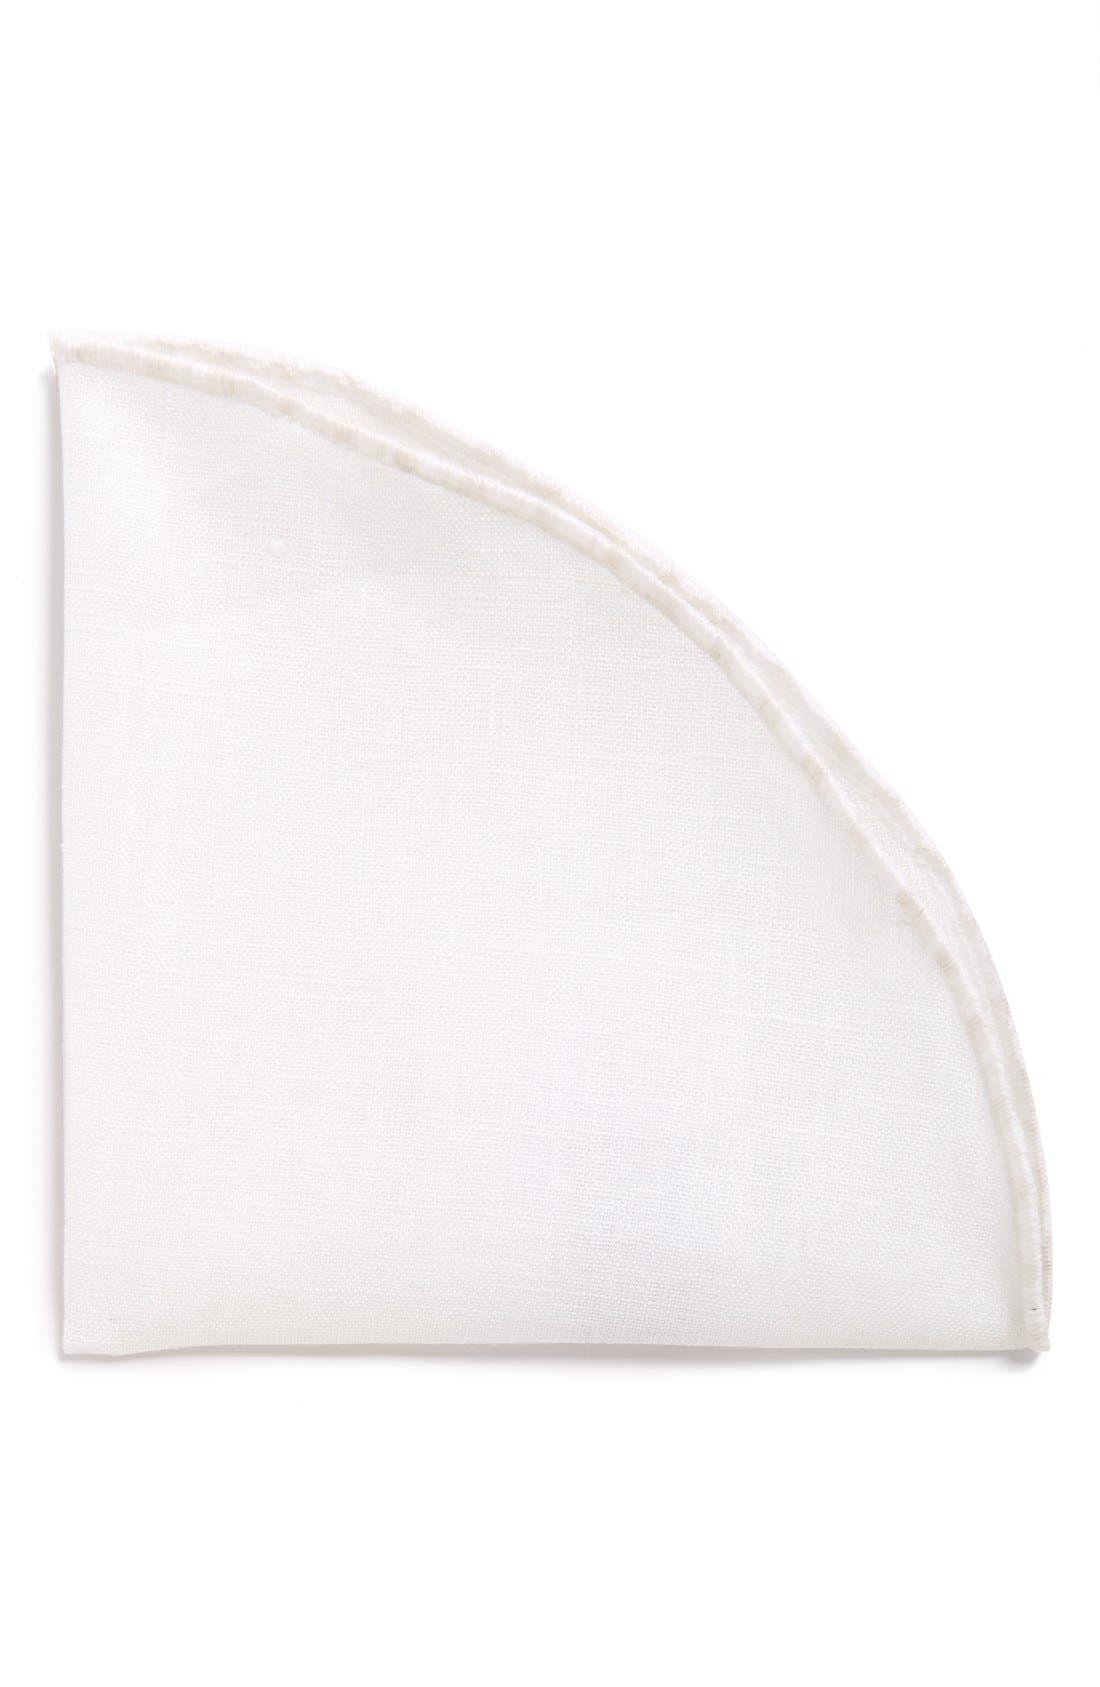 ALEXANDER OLCH Linen Pocket Round, Main, color, 100